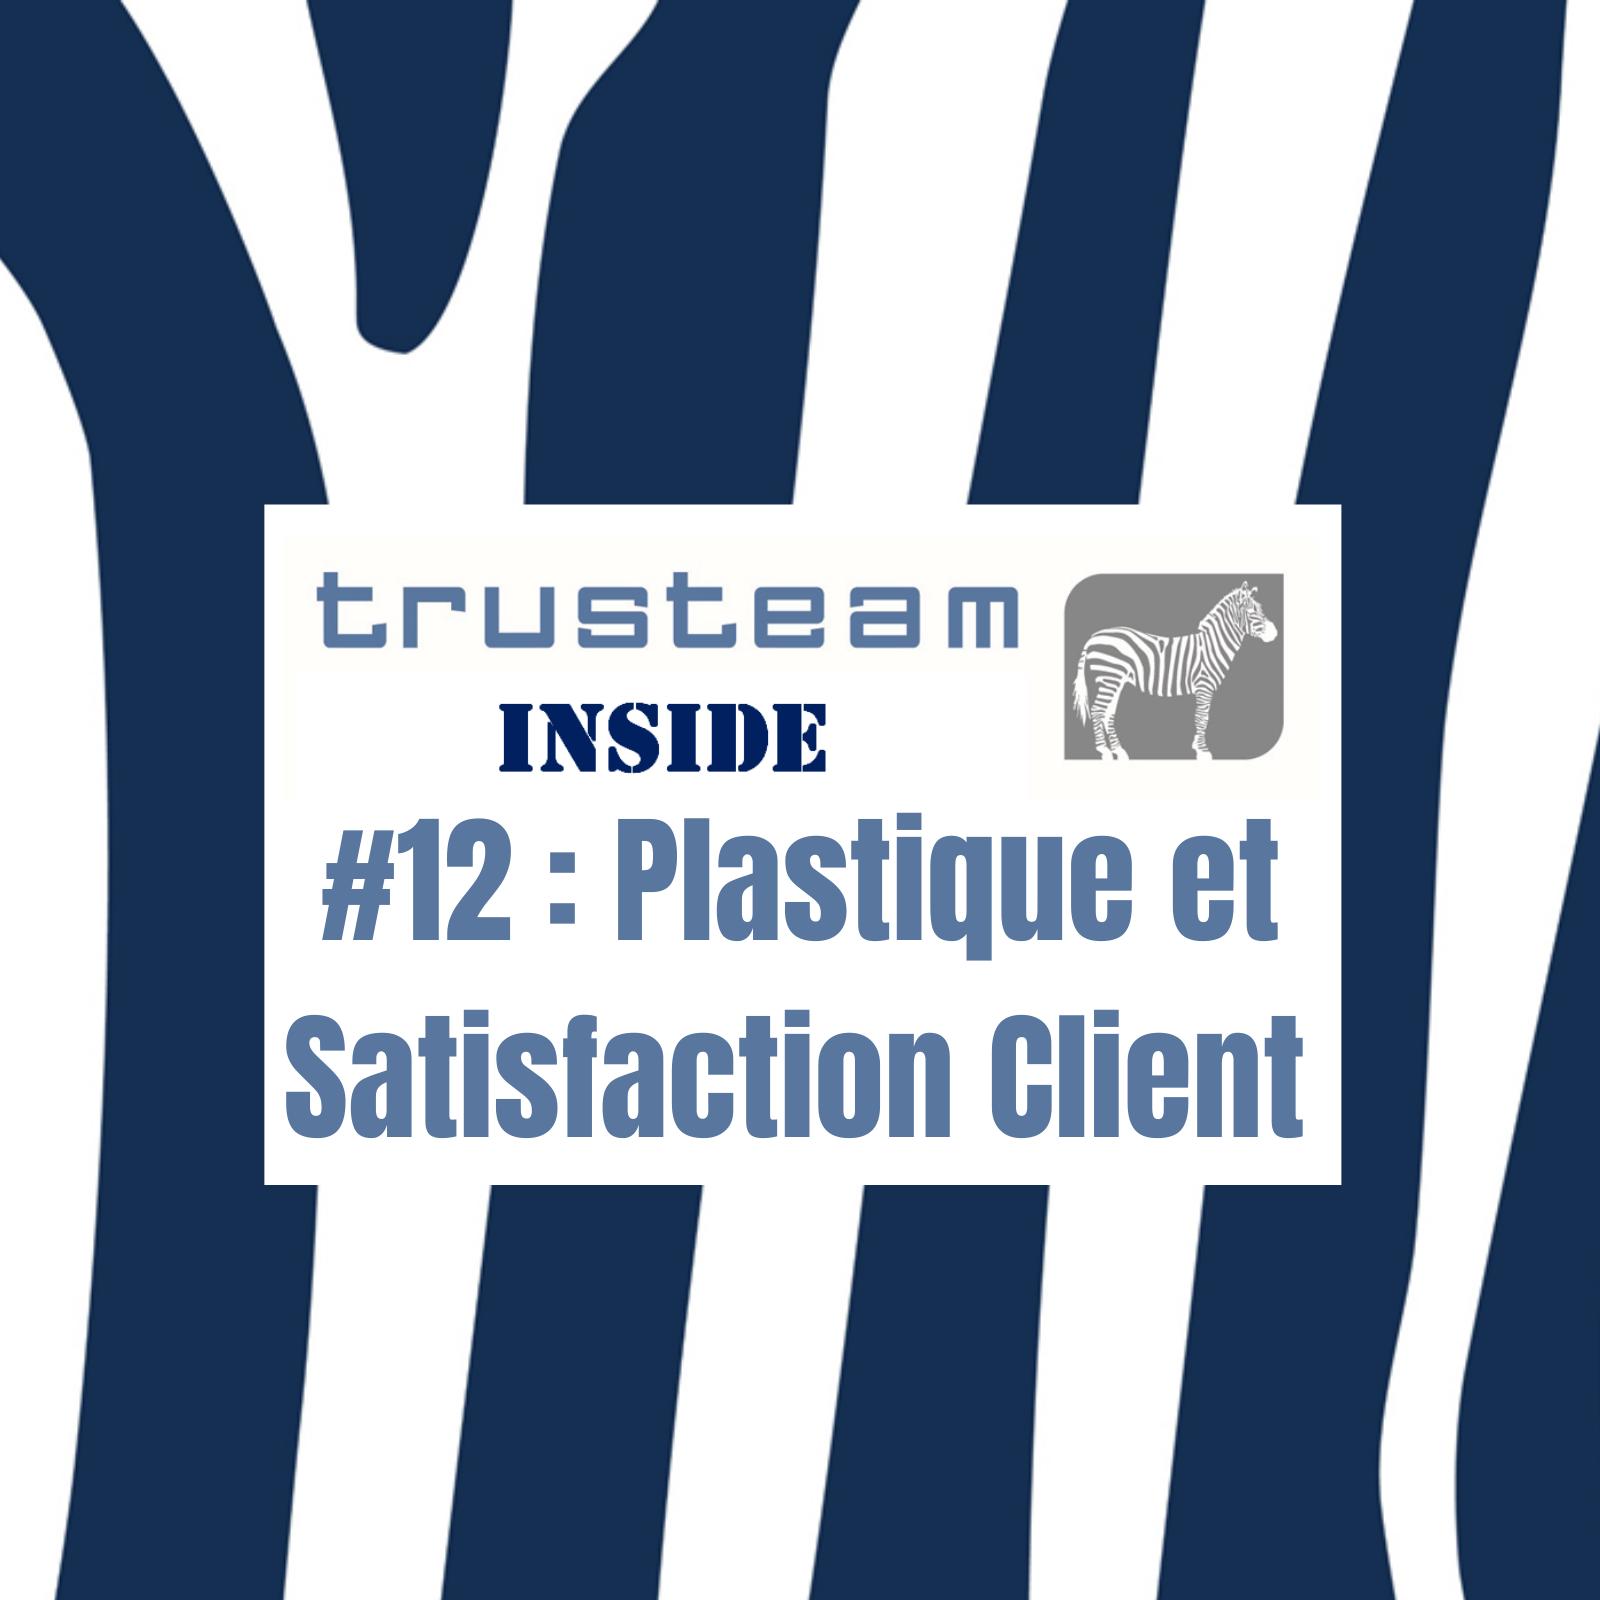 #12 Newsletter ISR - Plastique et Satisfaction Client